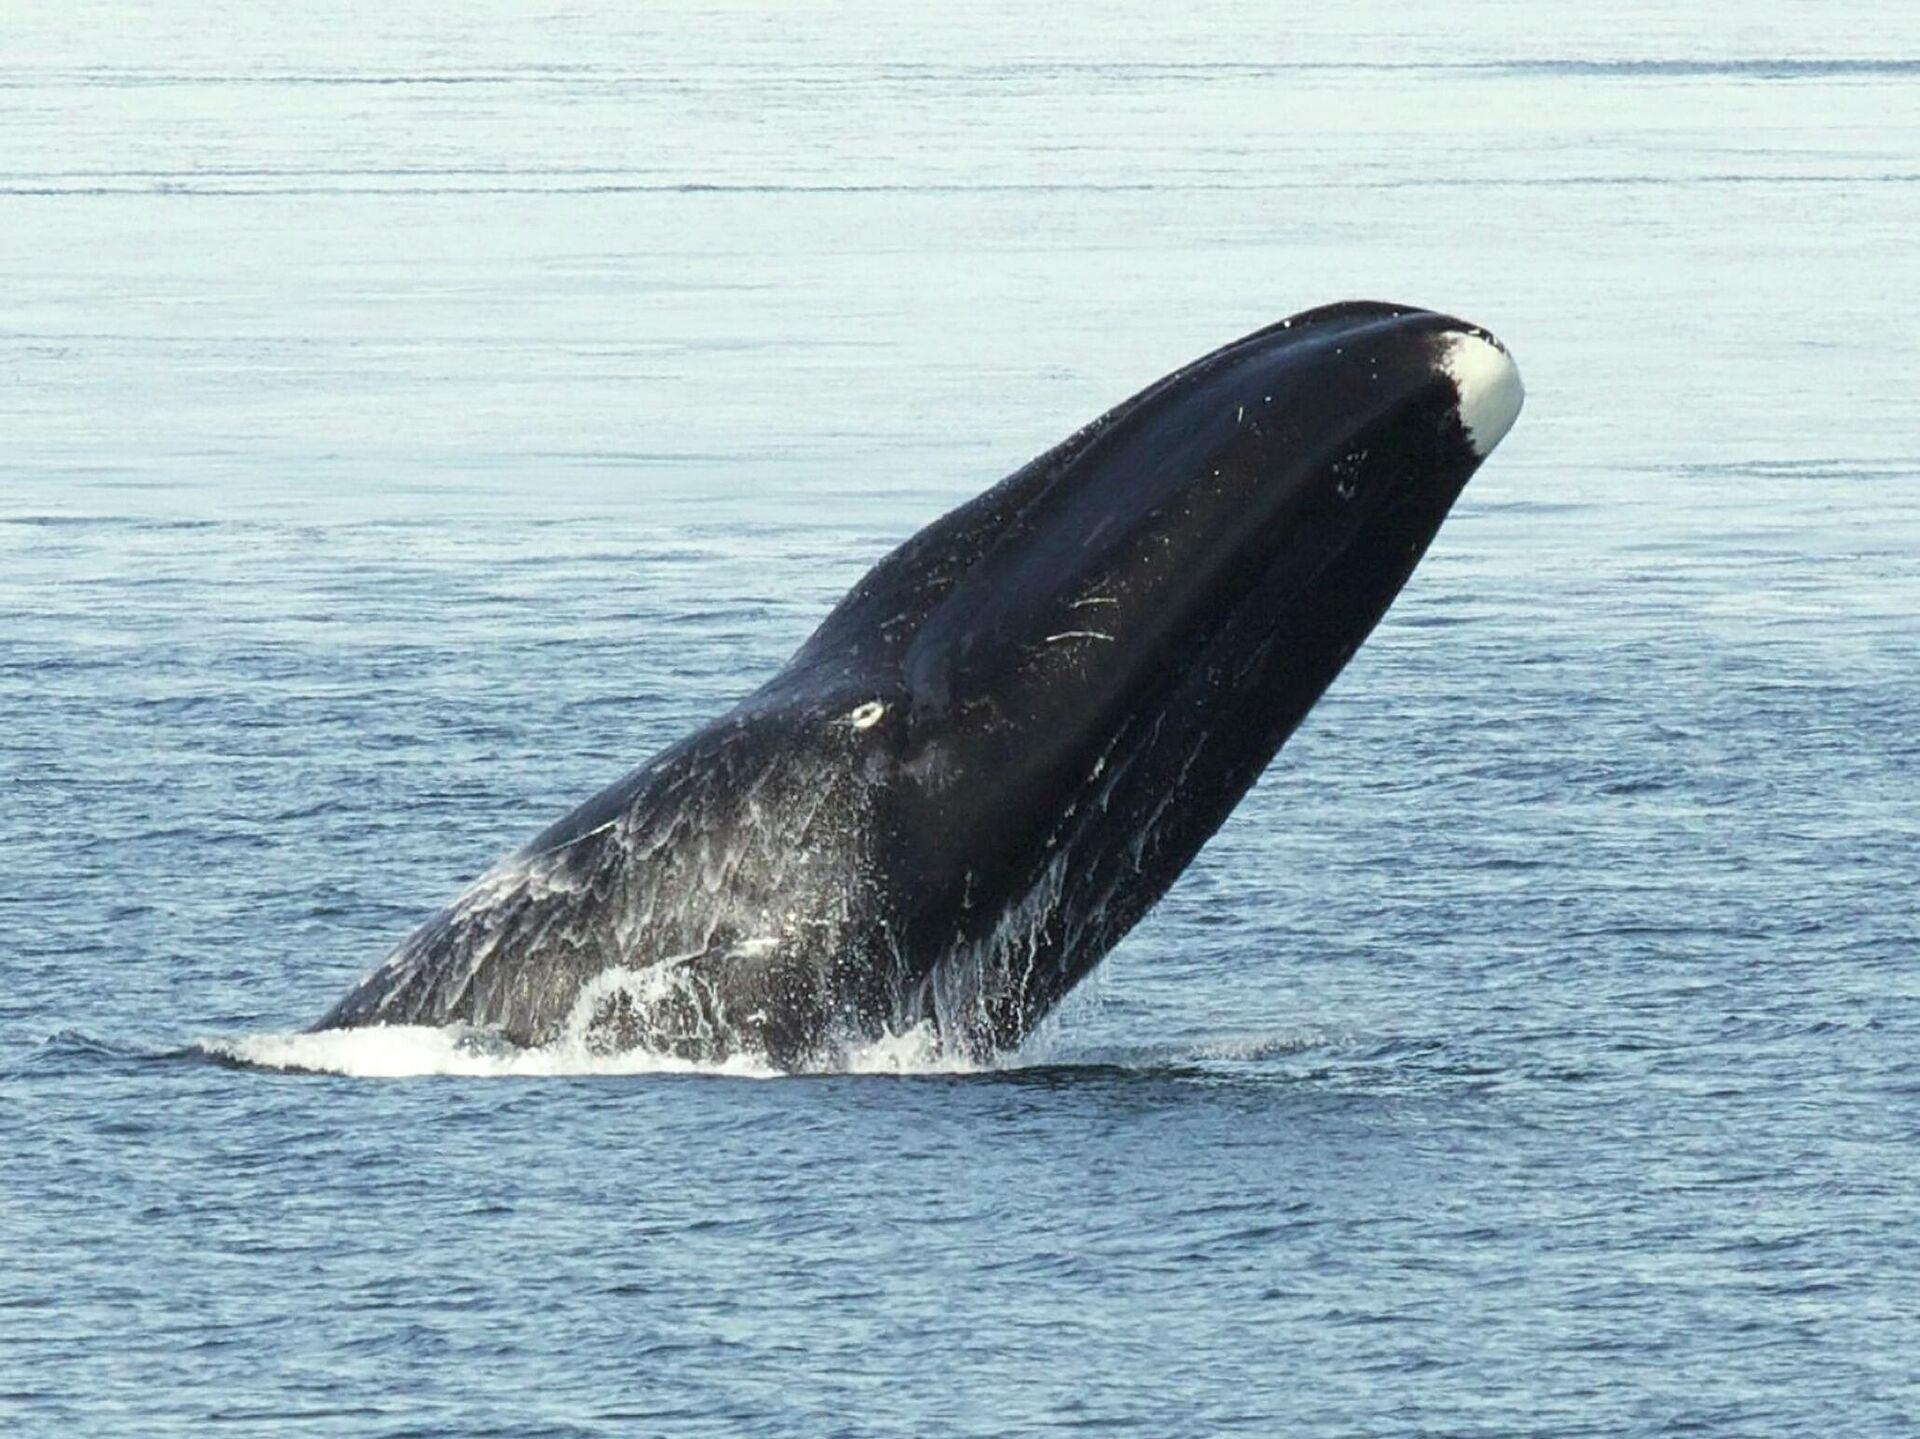 Una ballena de Groenlandia - Sputnik Mundo, 1920, 17.08.2021